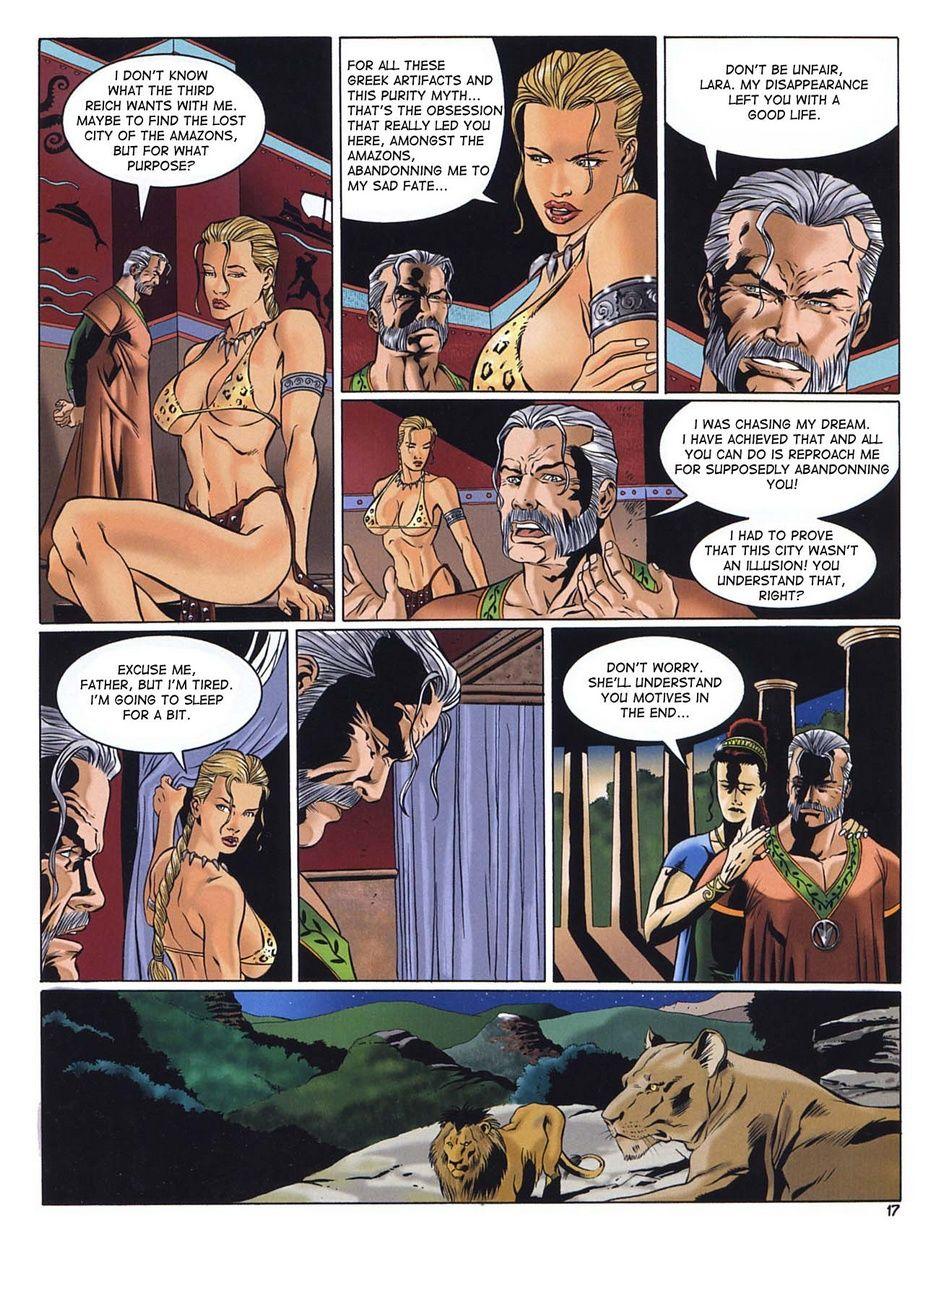 Lara jones and the amazon sex pics erotic picture